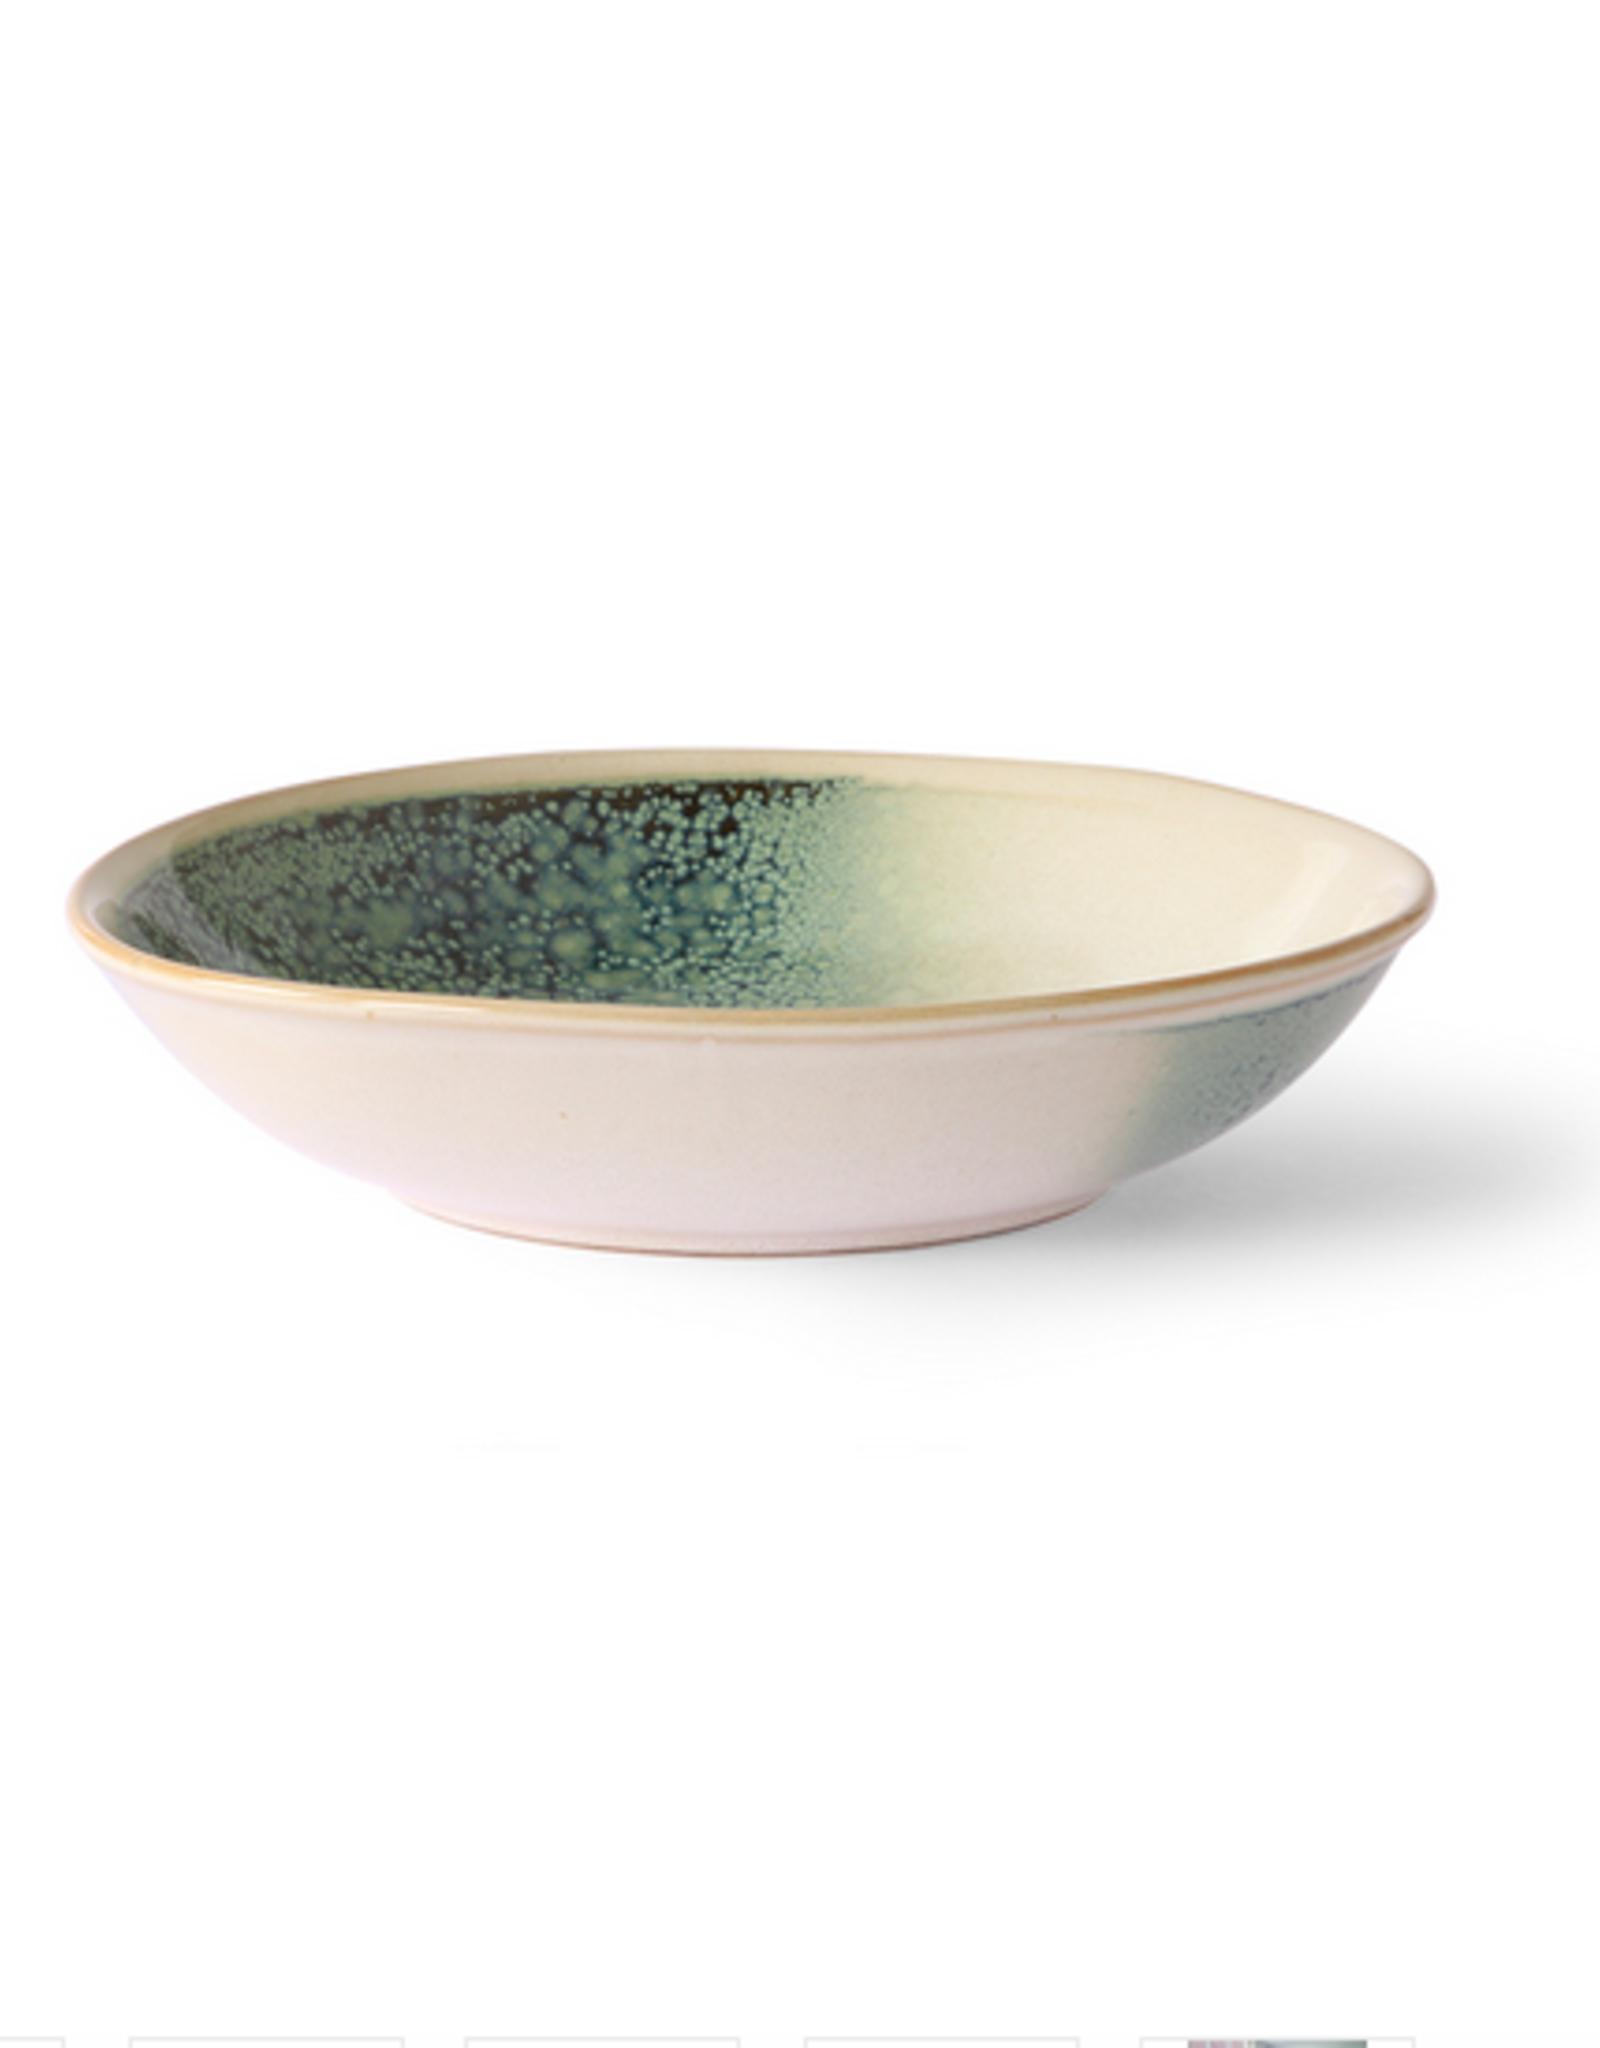 HK Living Ceramic 70's curry bowls mist (set of 2)